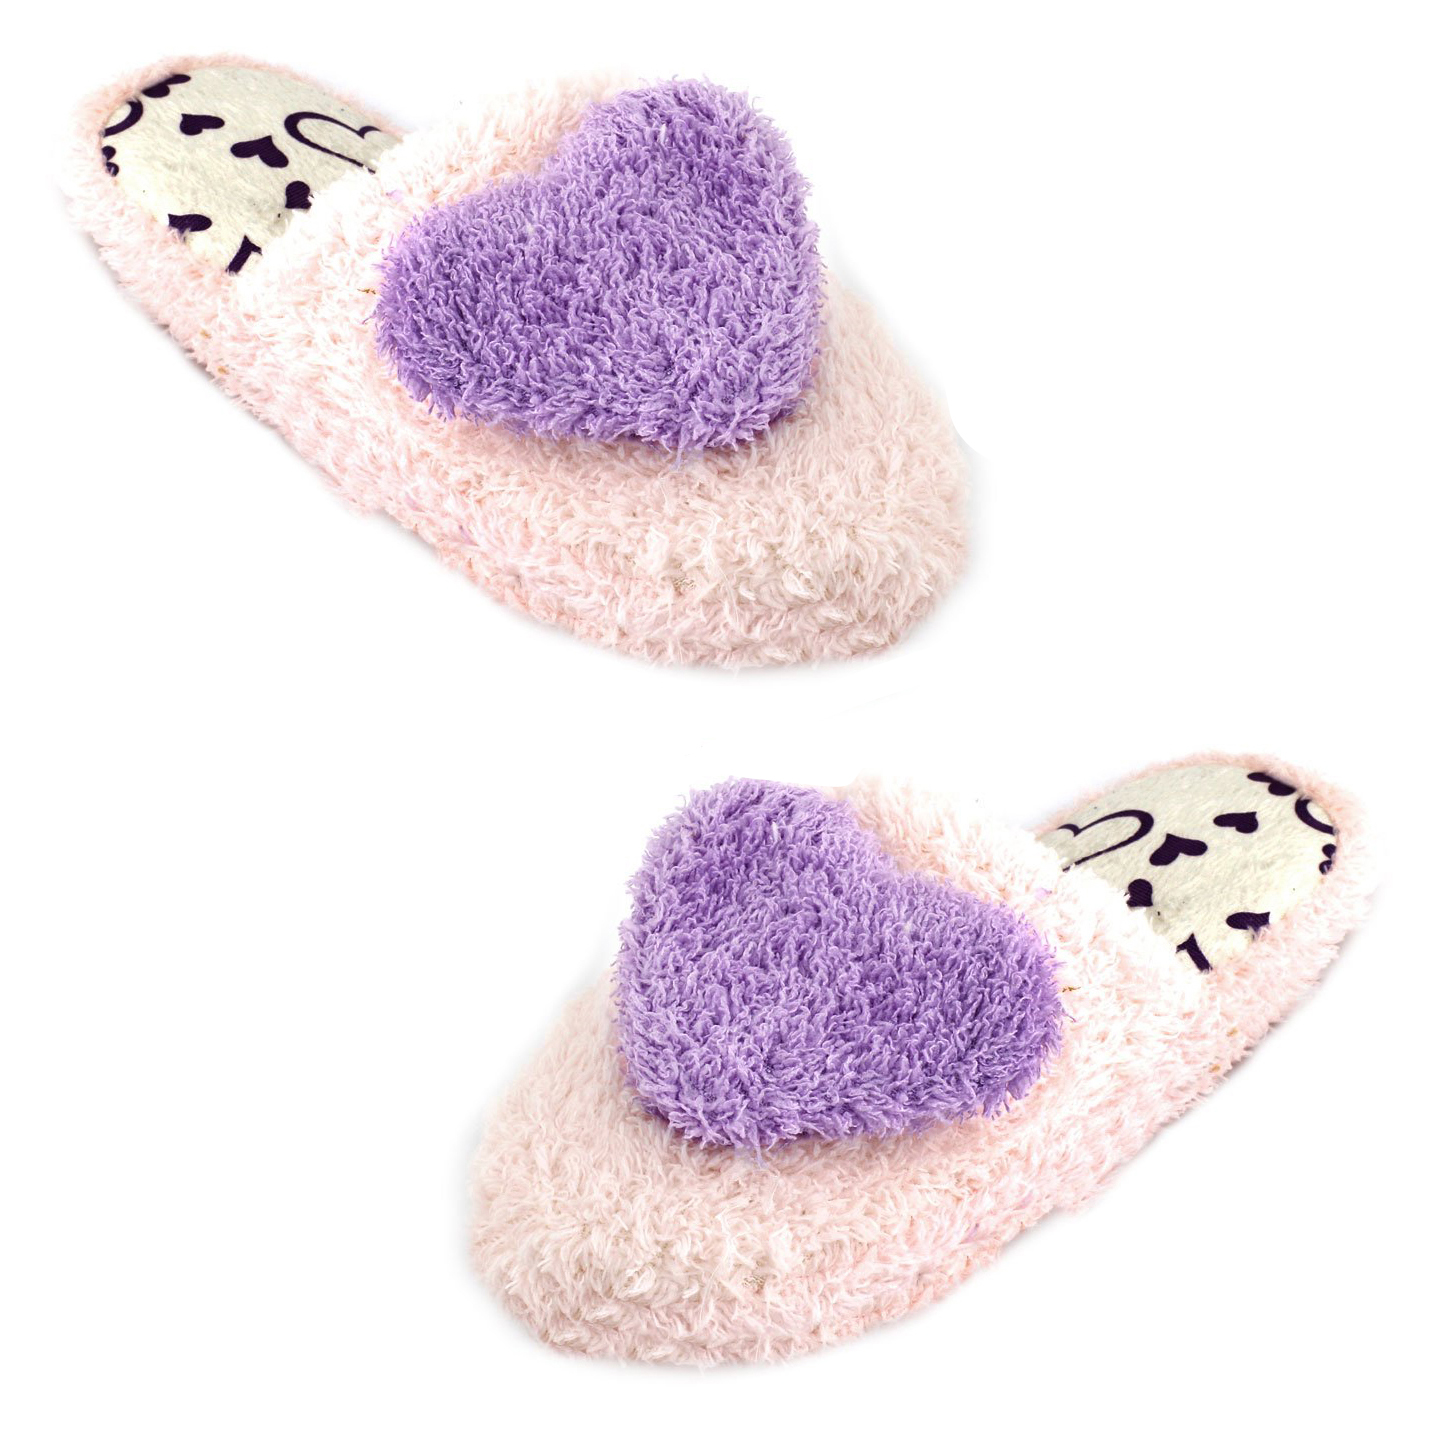 VSEN Hot Ladies Sweet Warm Light Pink Purple Plush Warm Warming Home Slippers Winter Cute Heart Patterns Slippers Women 6.5